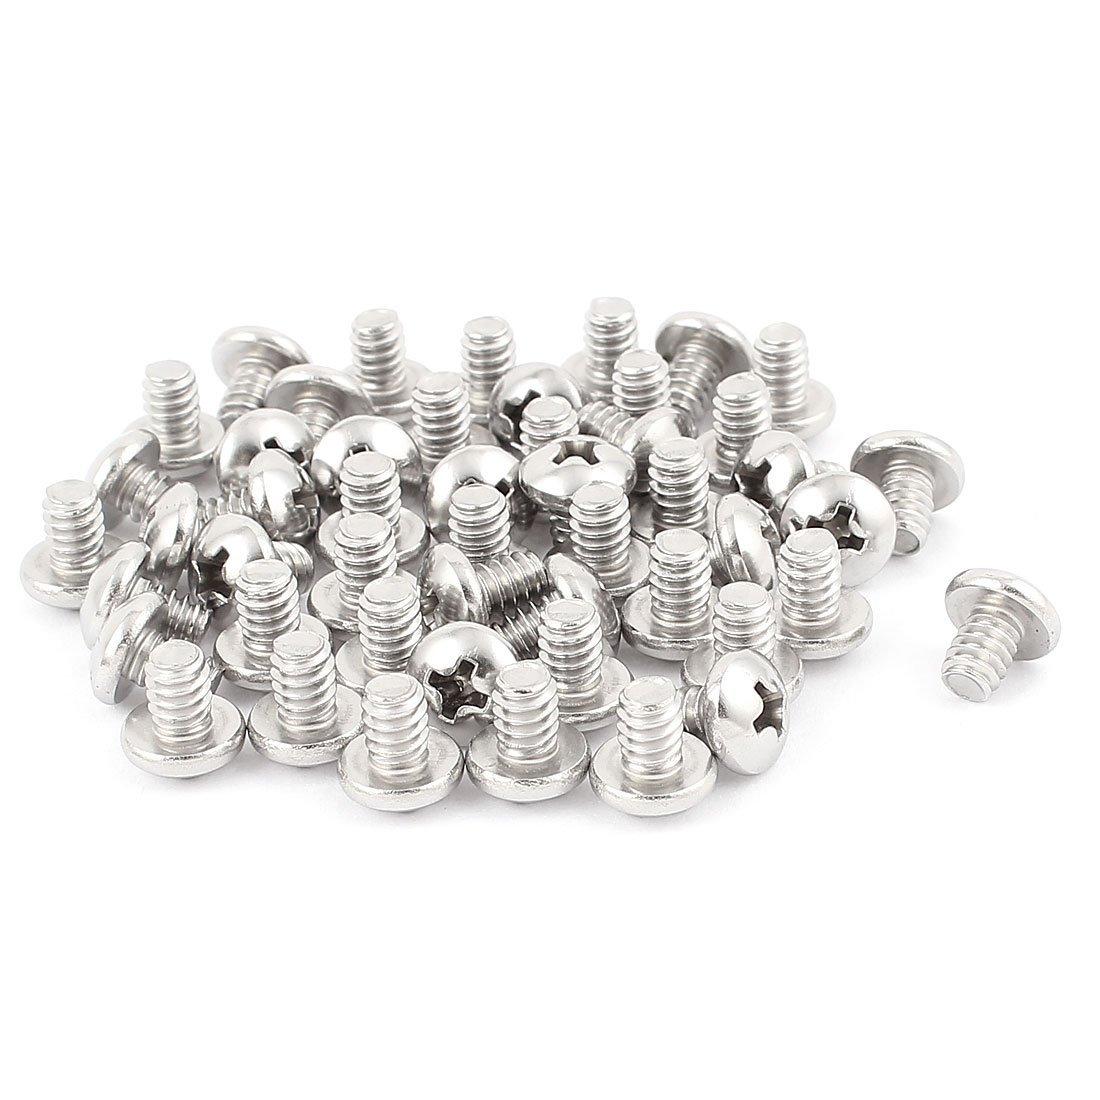 #10-24 x 1/4 Inch Phillips Truss Head Machine Screws Fasteners 50pcs amt9518 10 4 inch